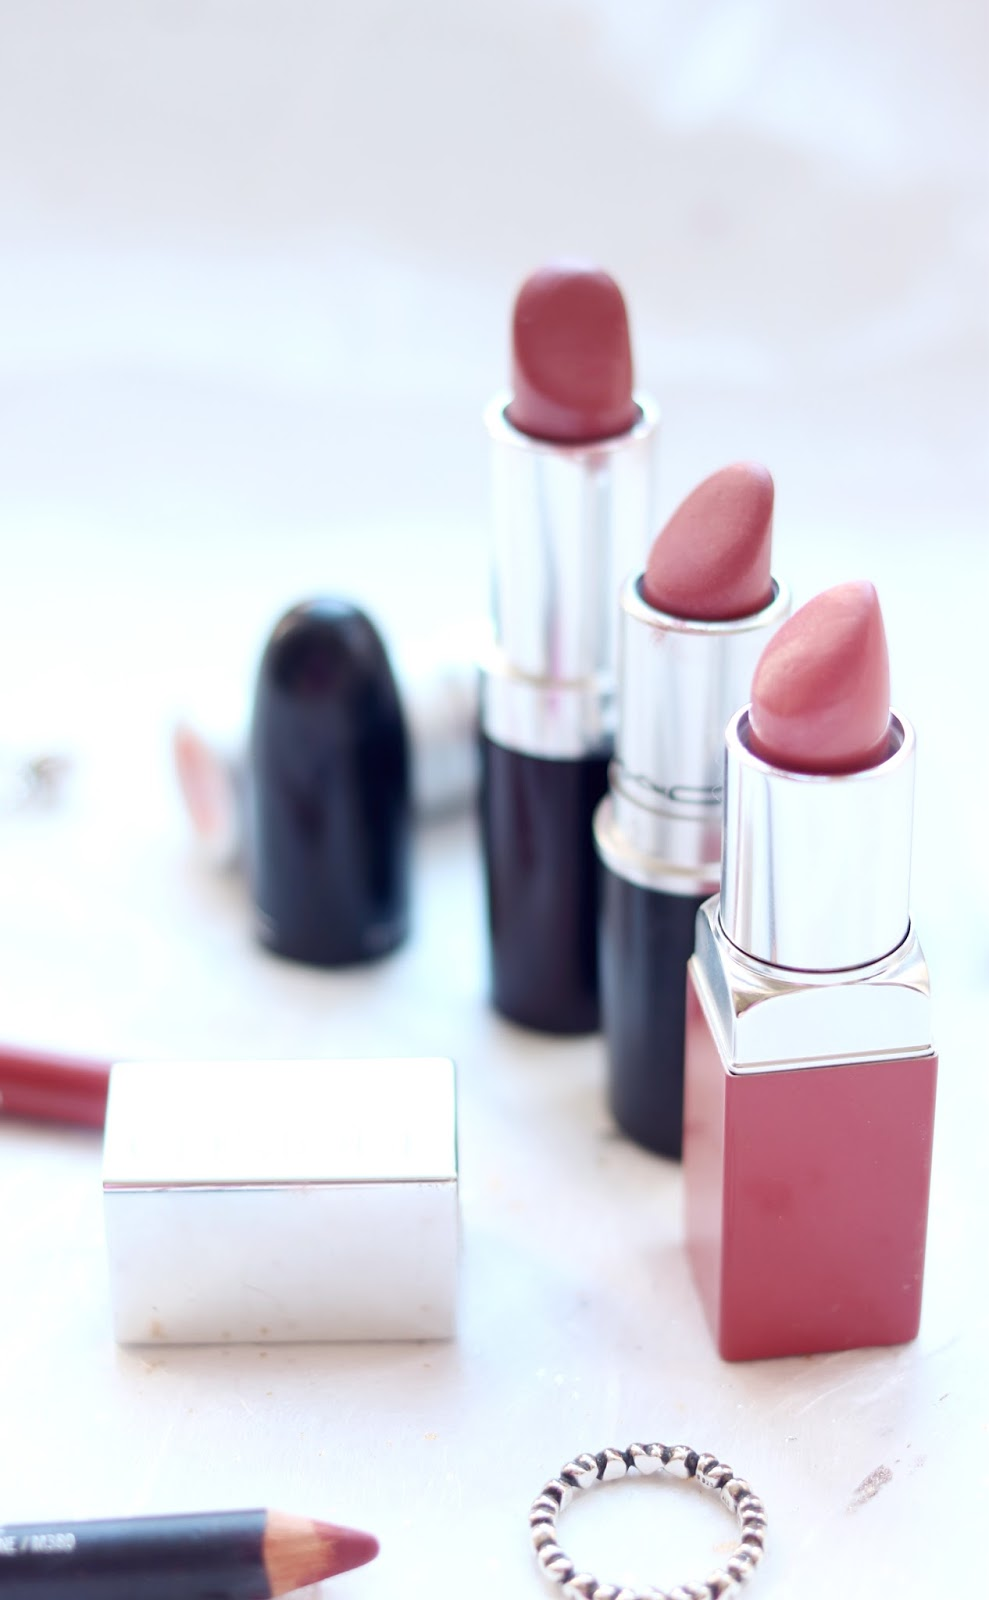 Everyday Nude - Pink Lipsticks, Rimmel Lipstick in Asia, Clinique Pop and Prime Lipstick in Sugar Pop and MAC Lipstick in Brave